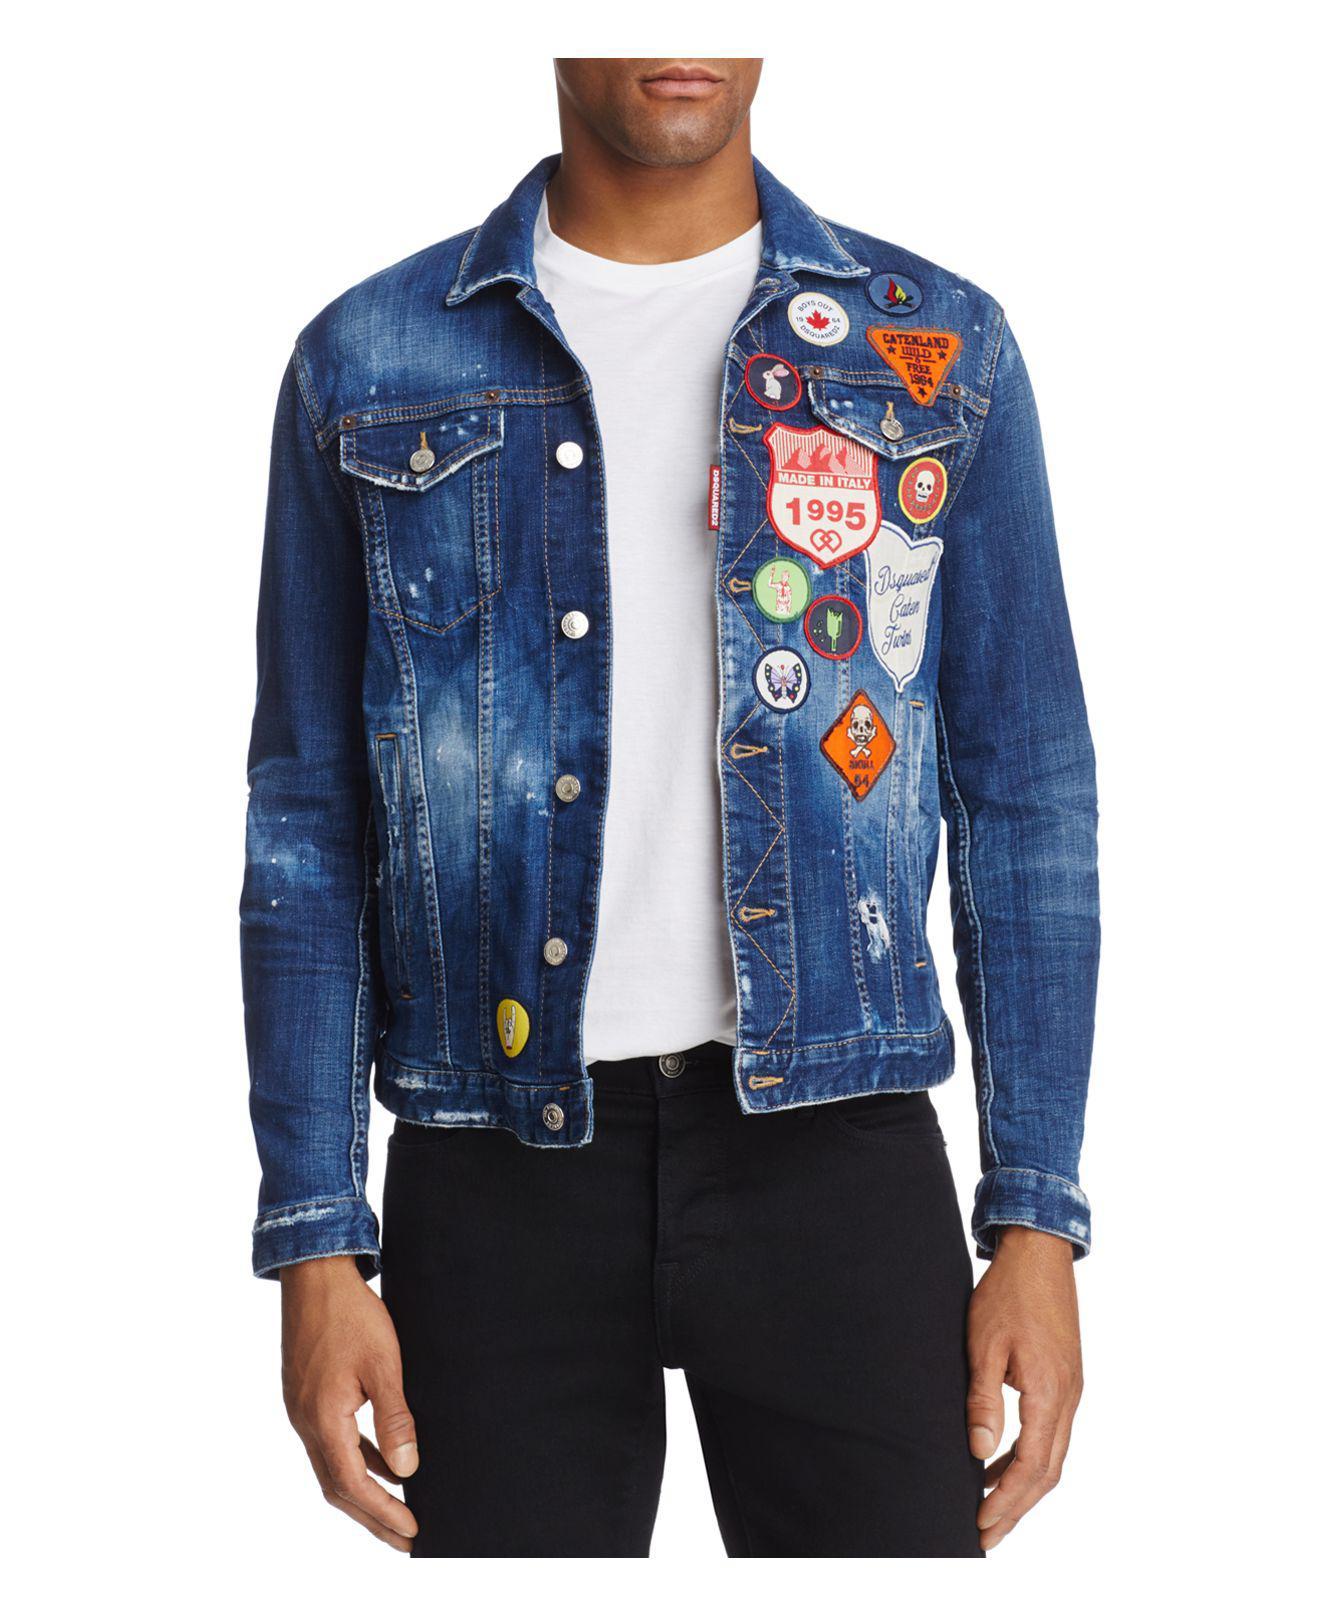 a22ead7c0bd Lyst - DSquared² Dan Patch Slim Fit Jean Jacket in Blue for Men